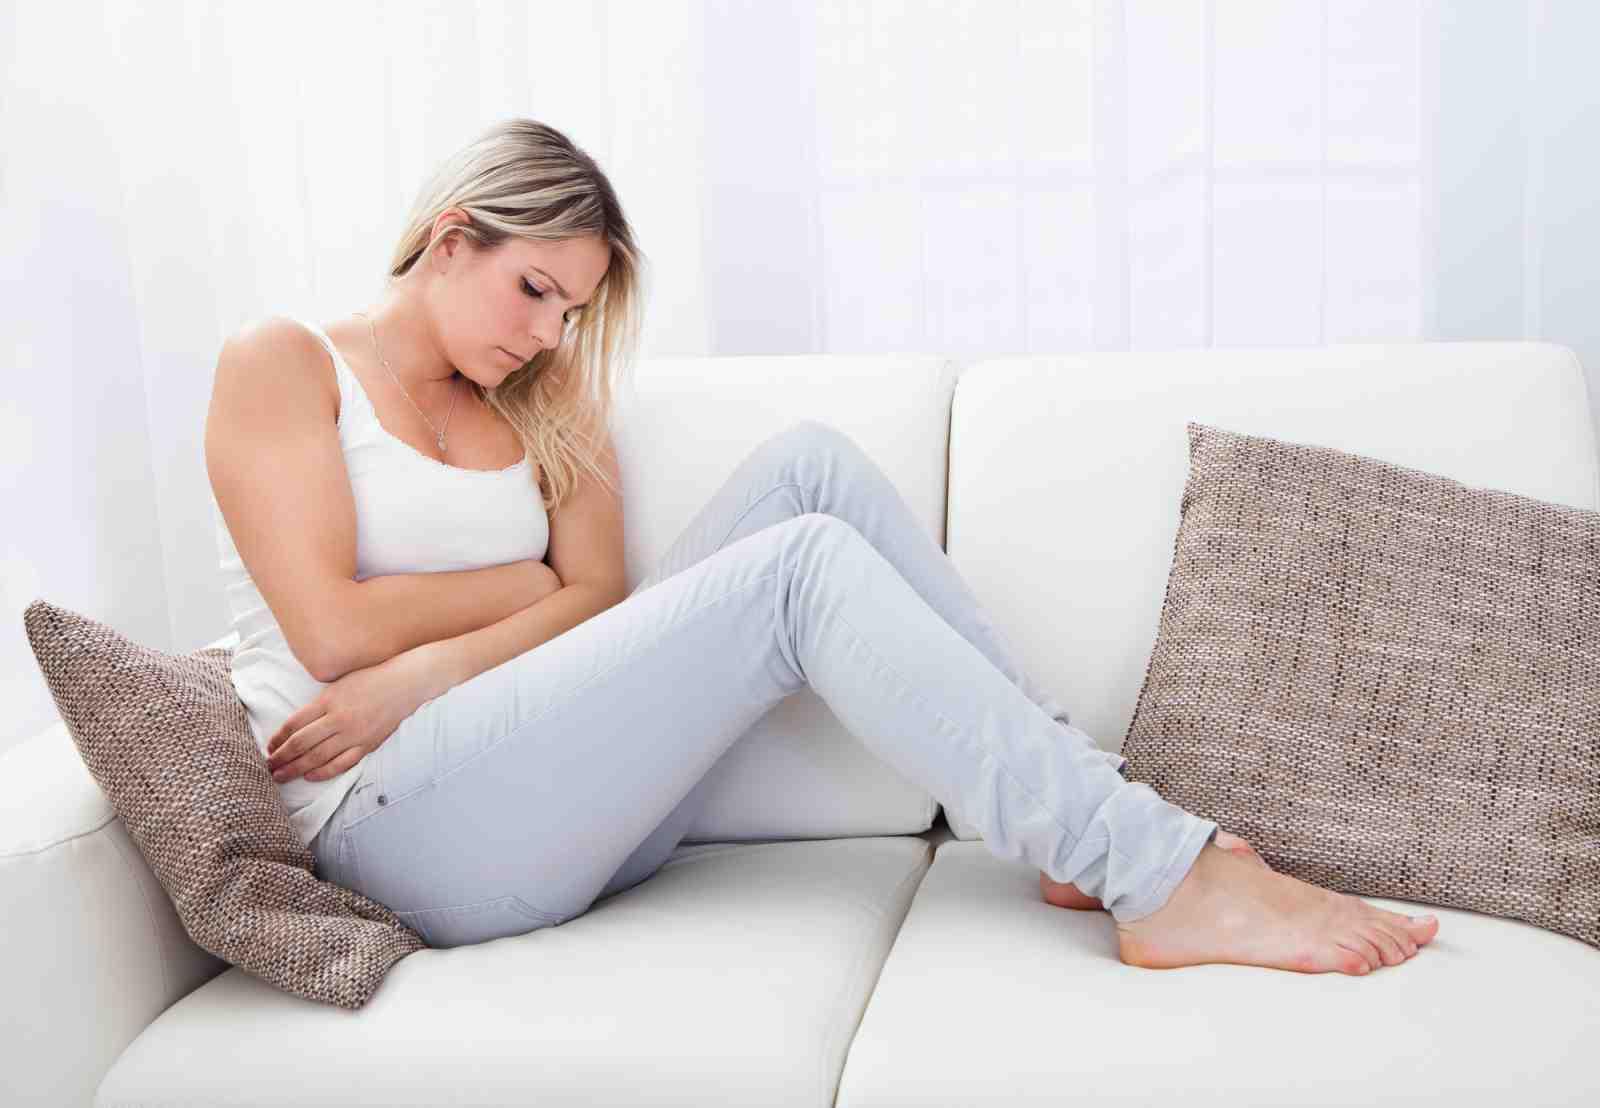 Amenorrea secondaria: sintomi, conseguenze e rimedi